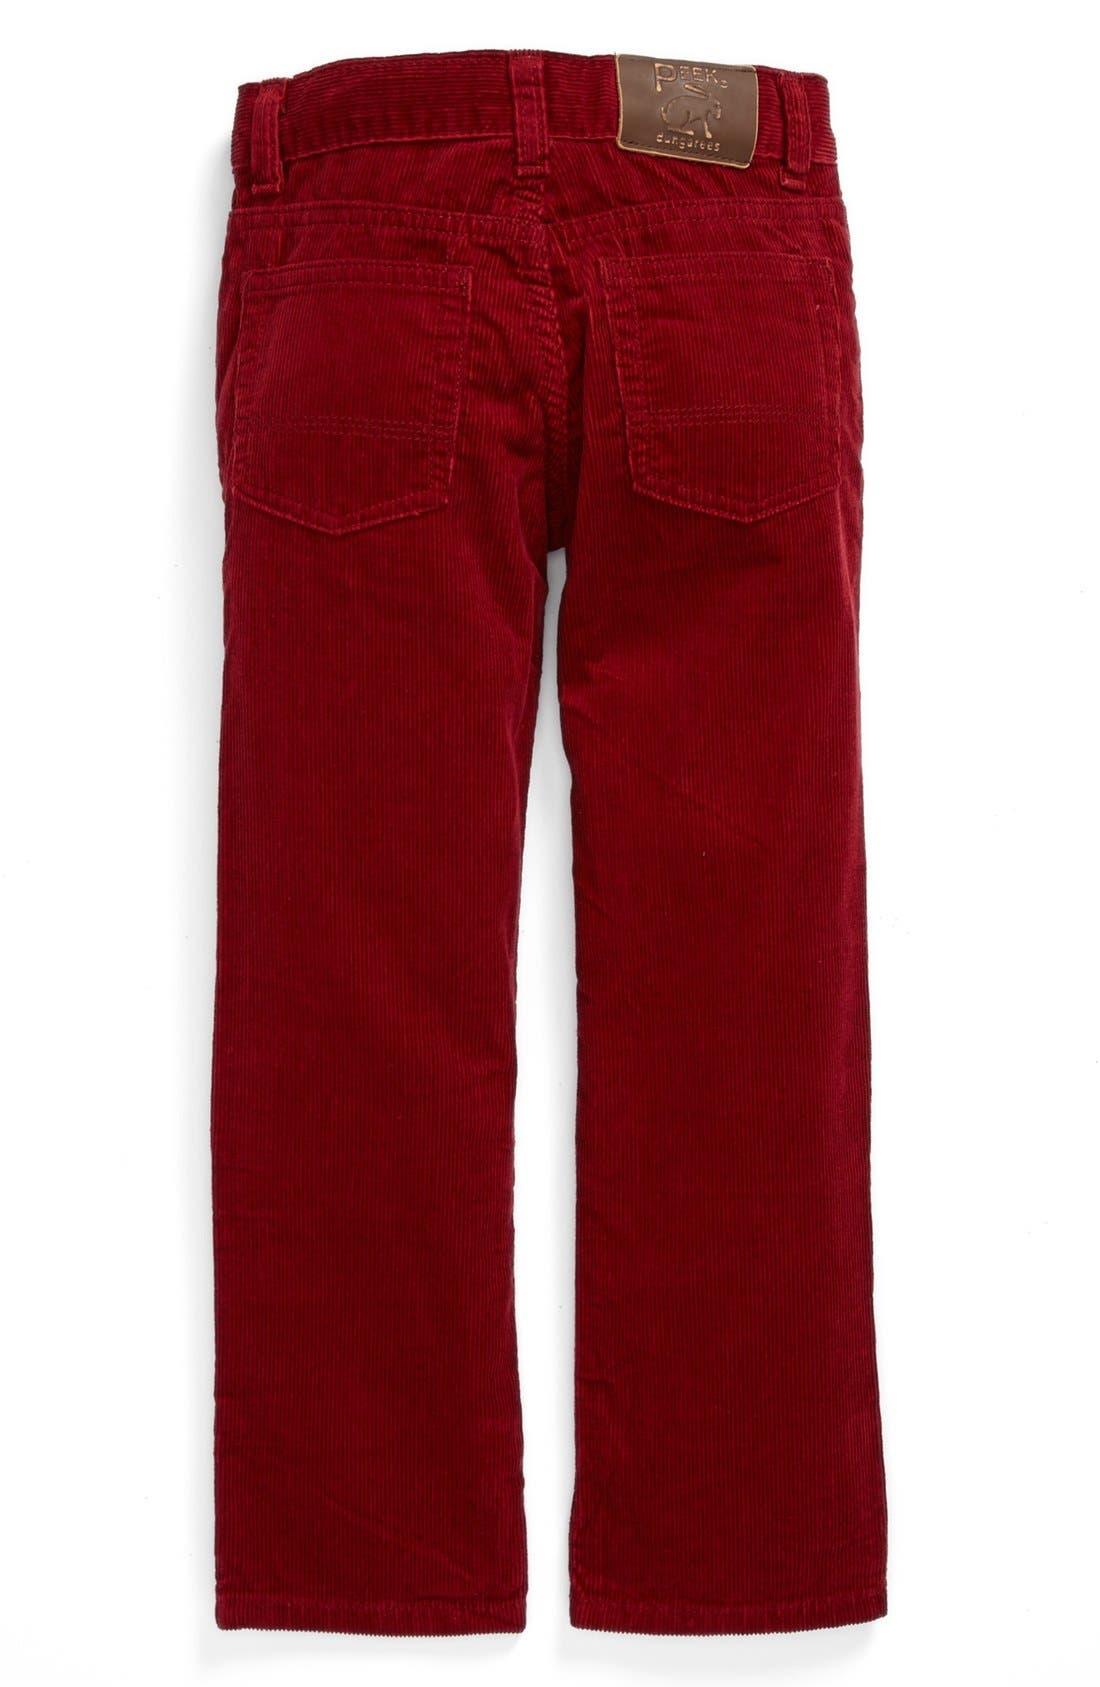 Alternate Image 2  - Peek Straight Leg Corduroy Pants (Baby Boys)